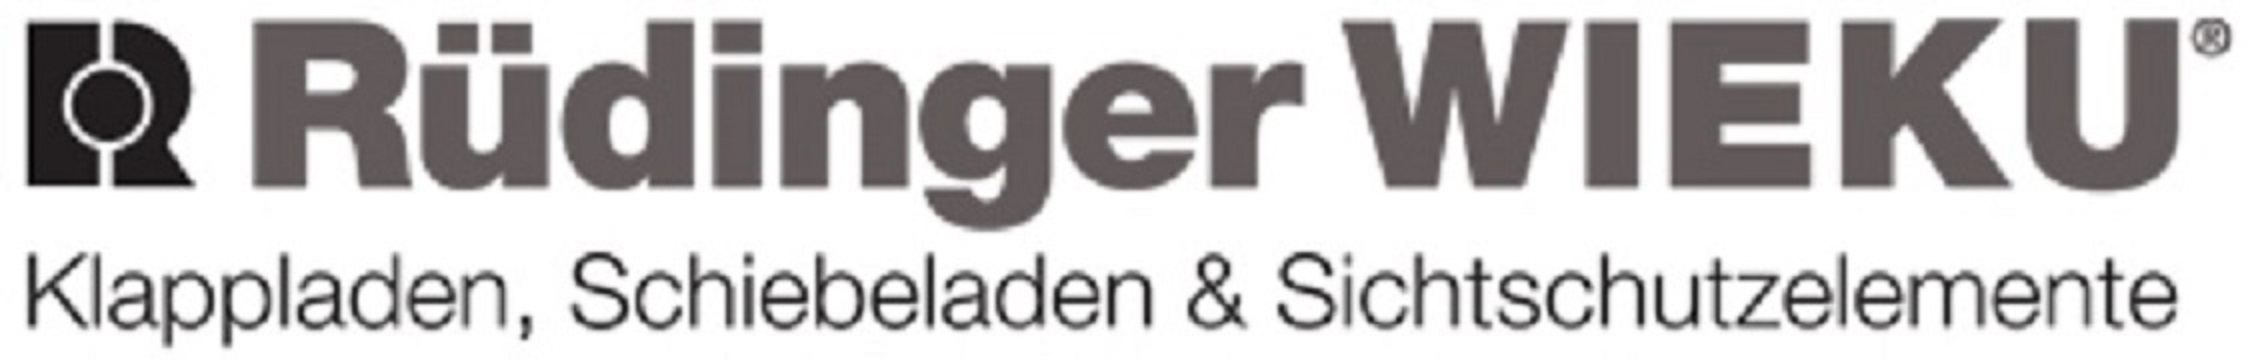 http://www.ruedinger-wieku.de